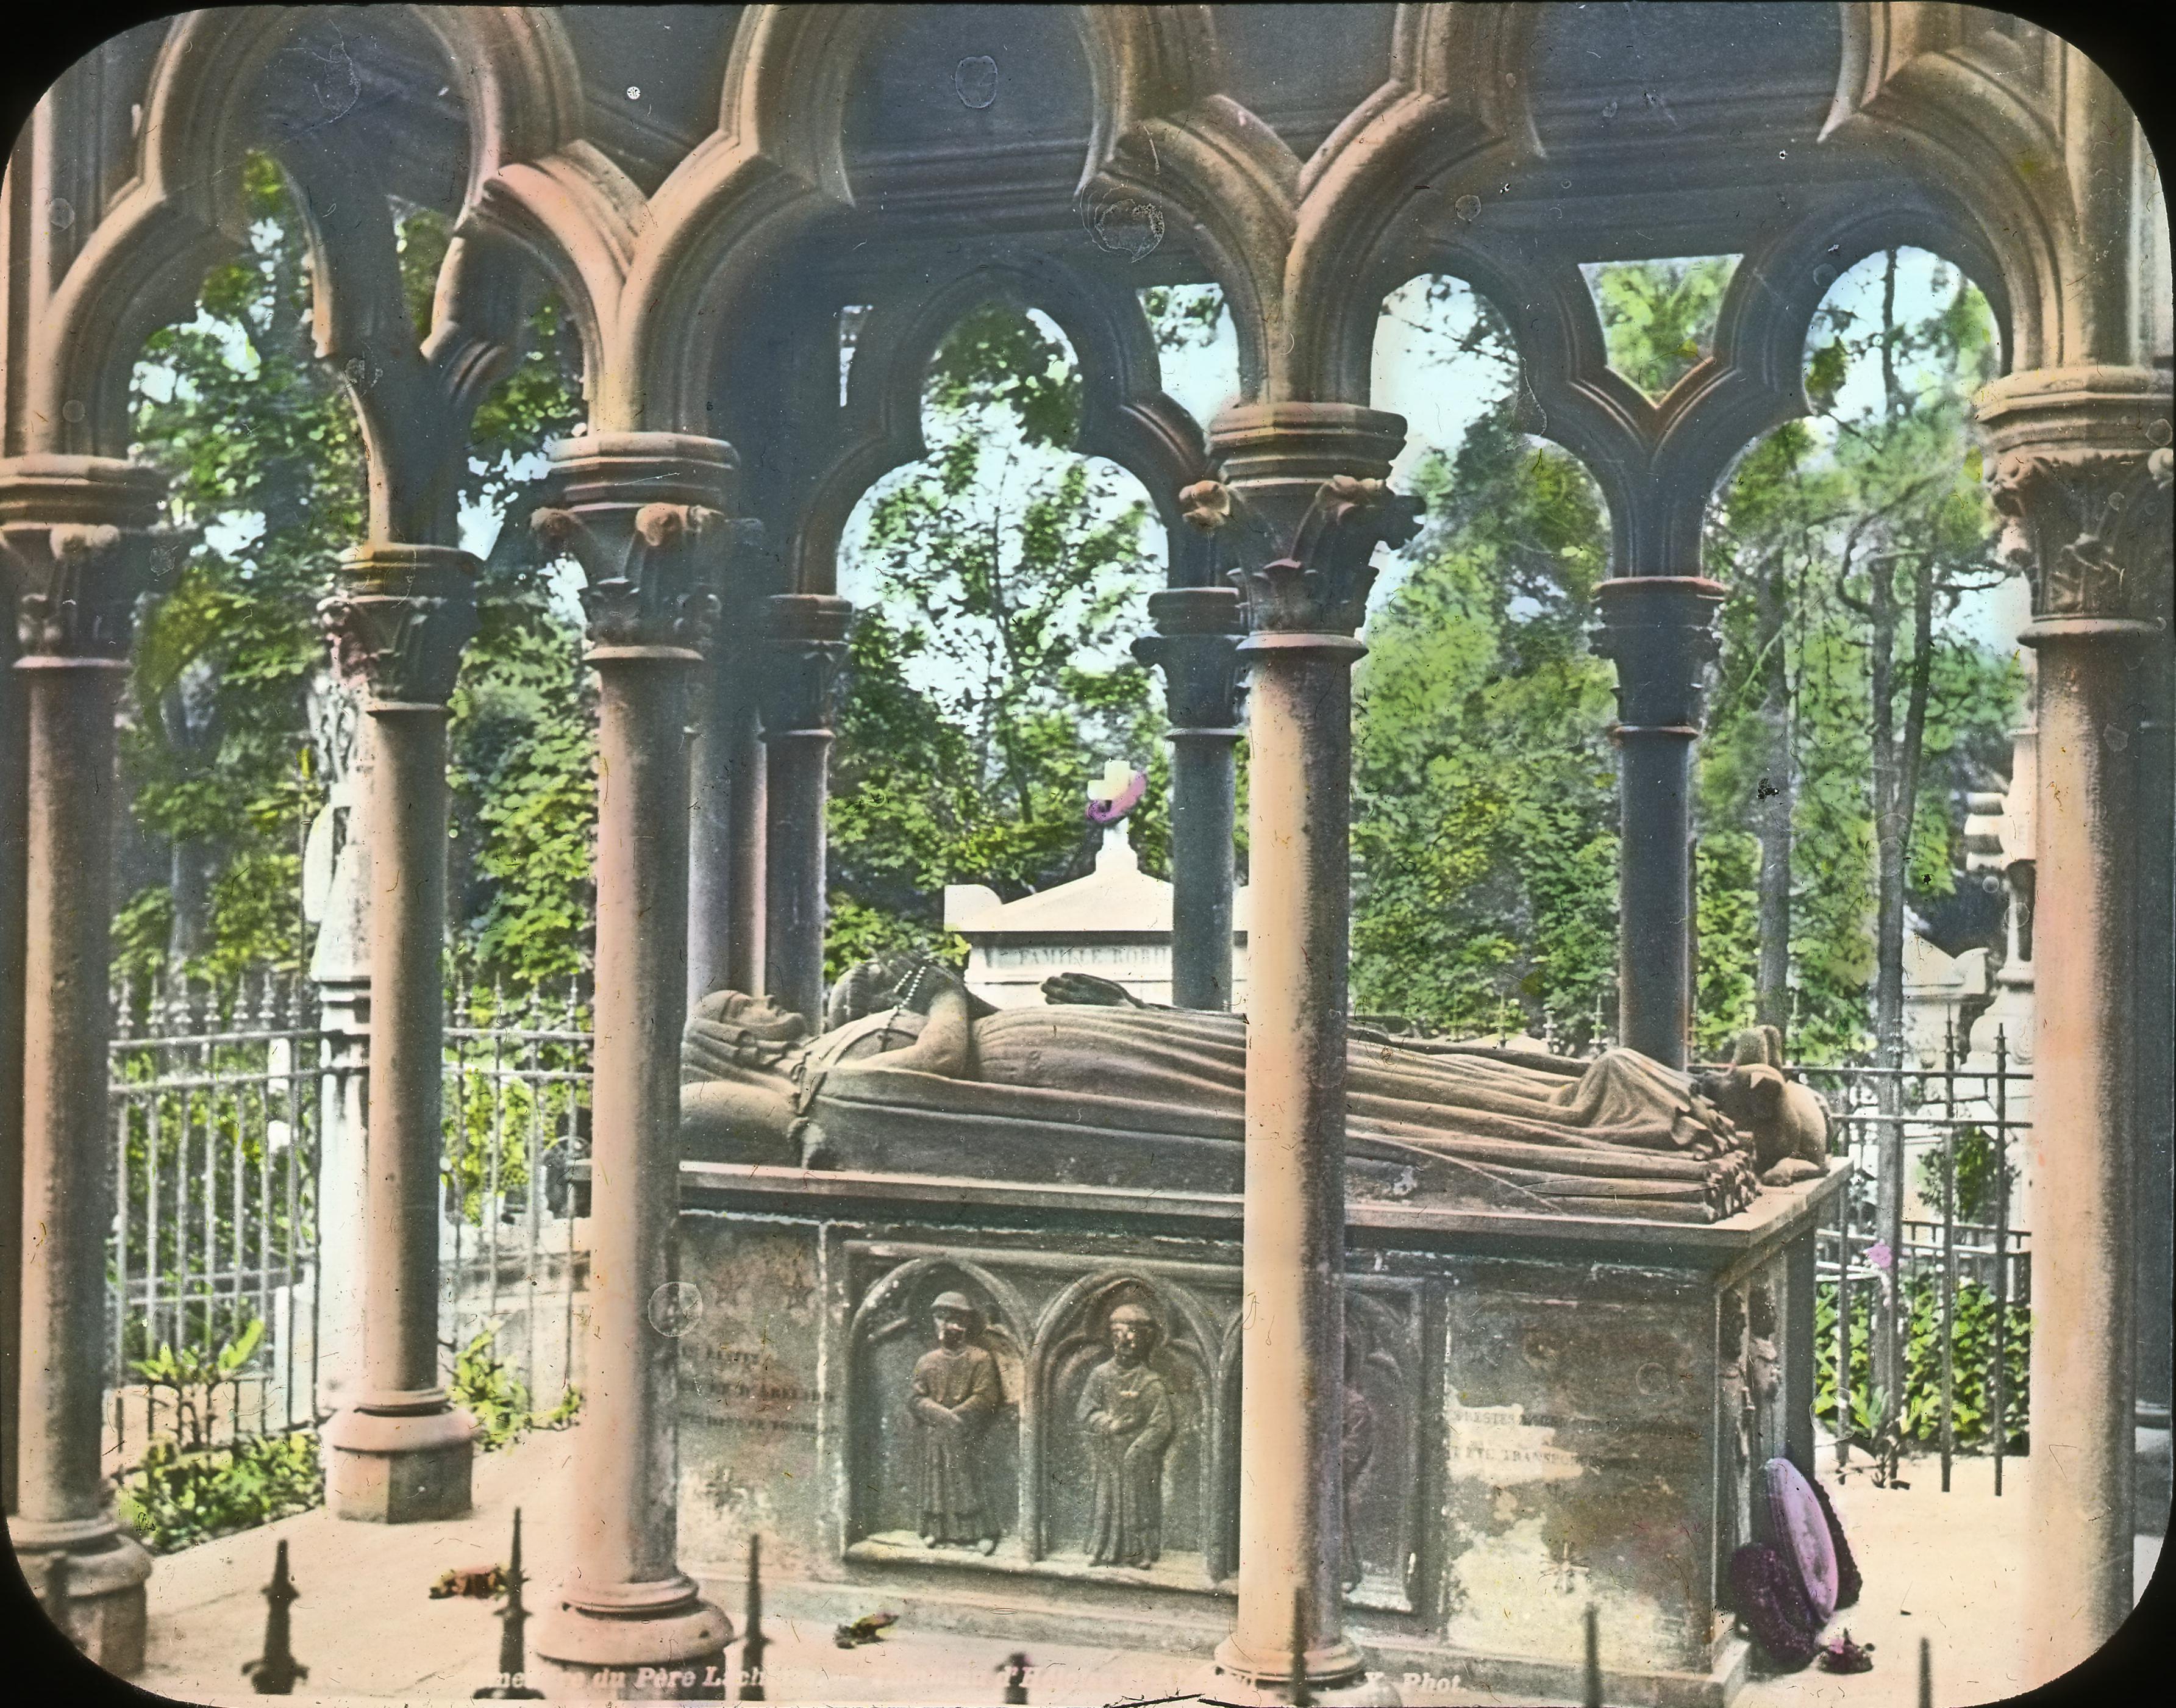 Могилы Пьера Абеляра и Элоизы на кладбище Пер-Лашез